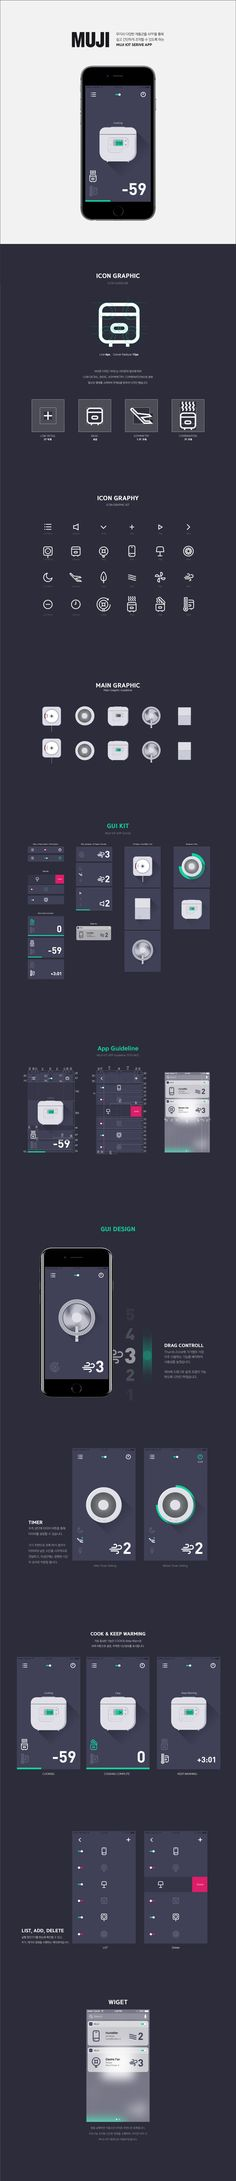 Kim, ki hyun   MUJI IOT APP GUI Concept   Visual Interface Design(2) 2017   Major in Digital Media Design │#hicoda │hicoda.hongik.ac.kr